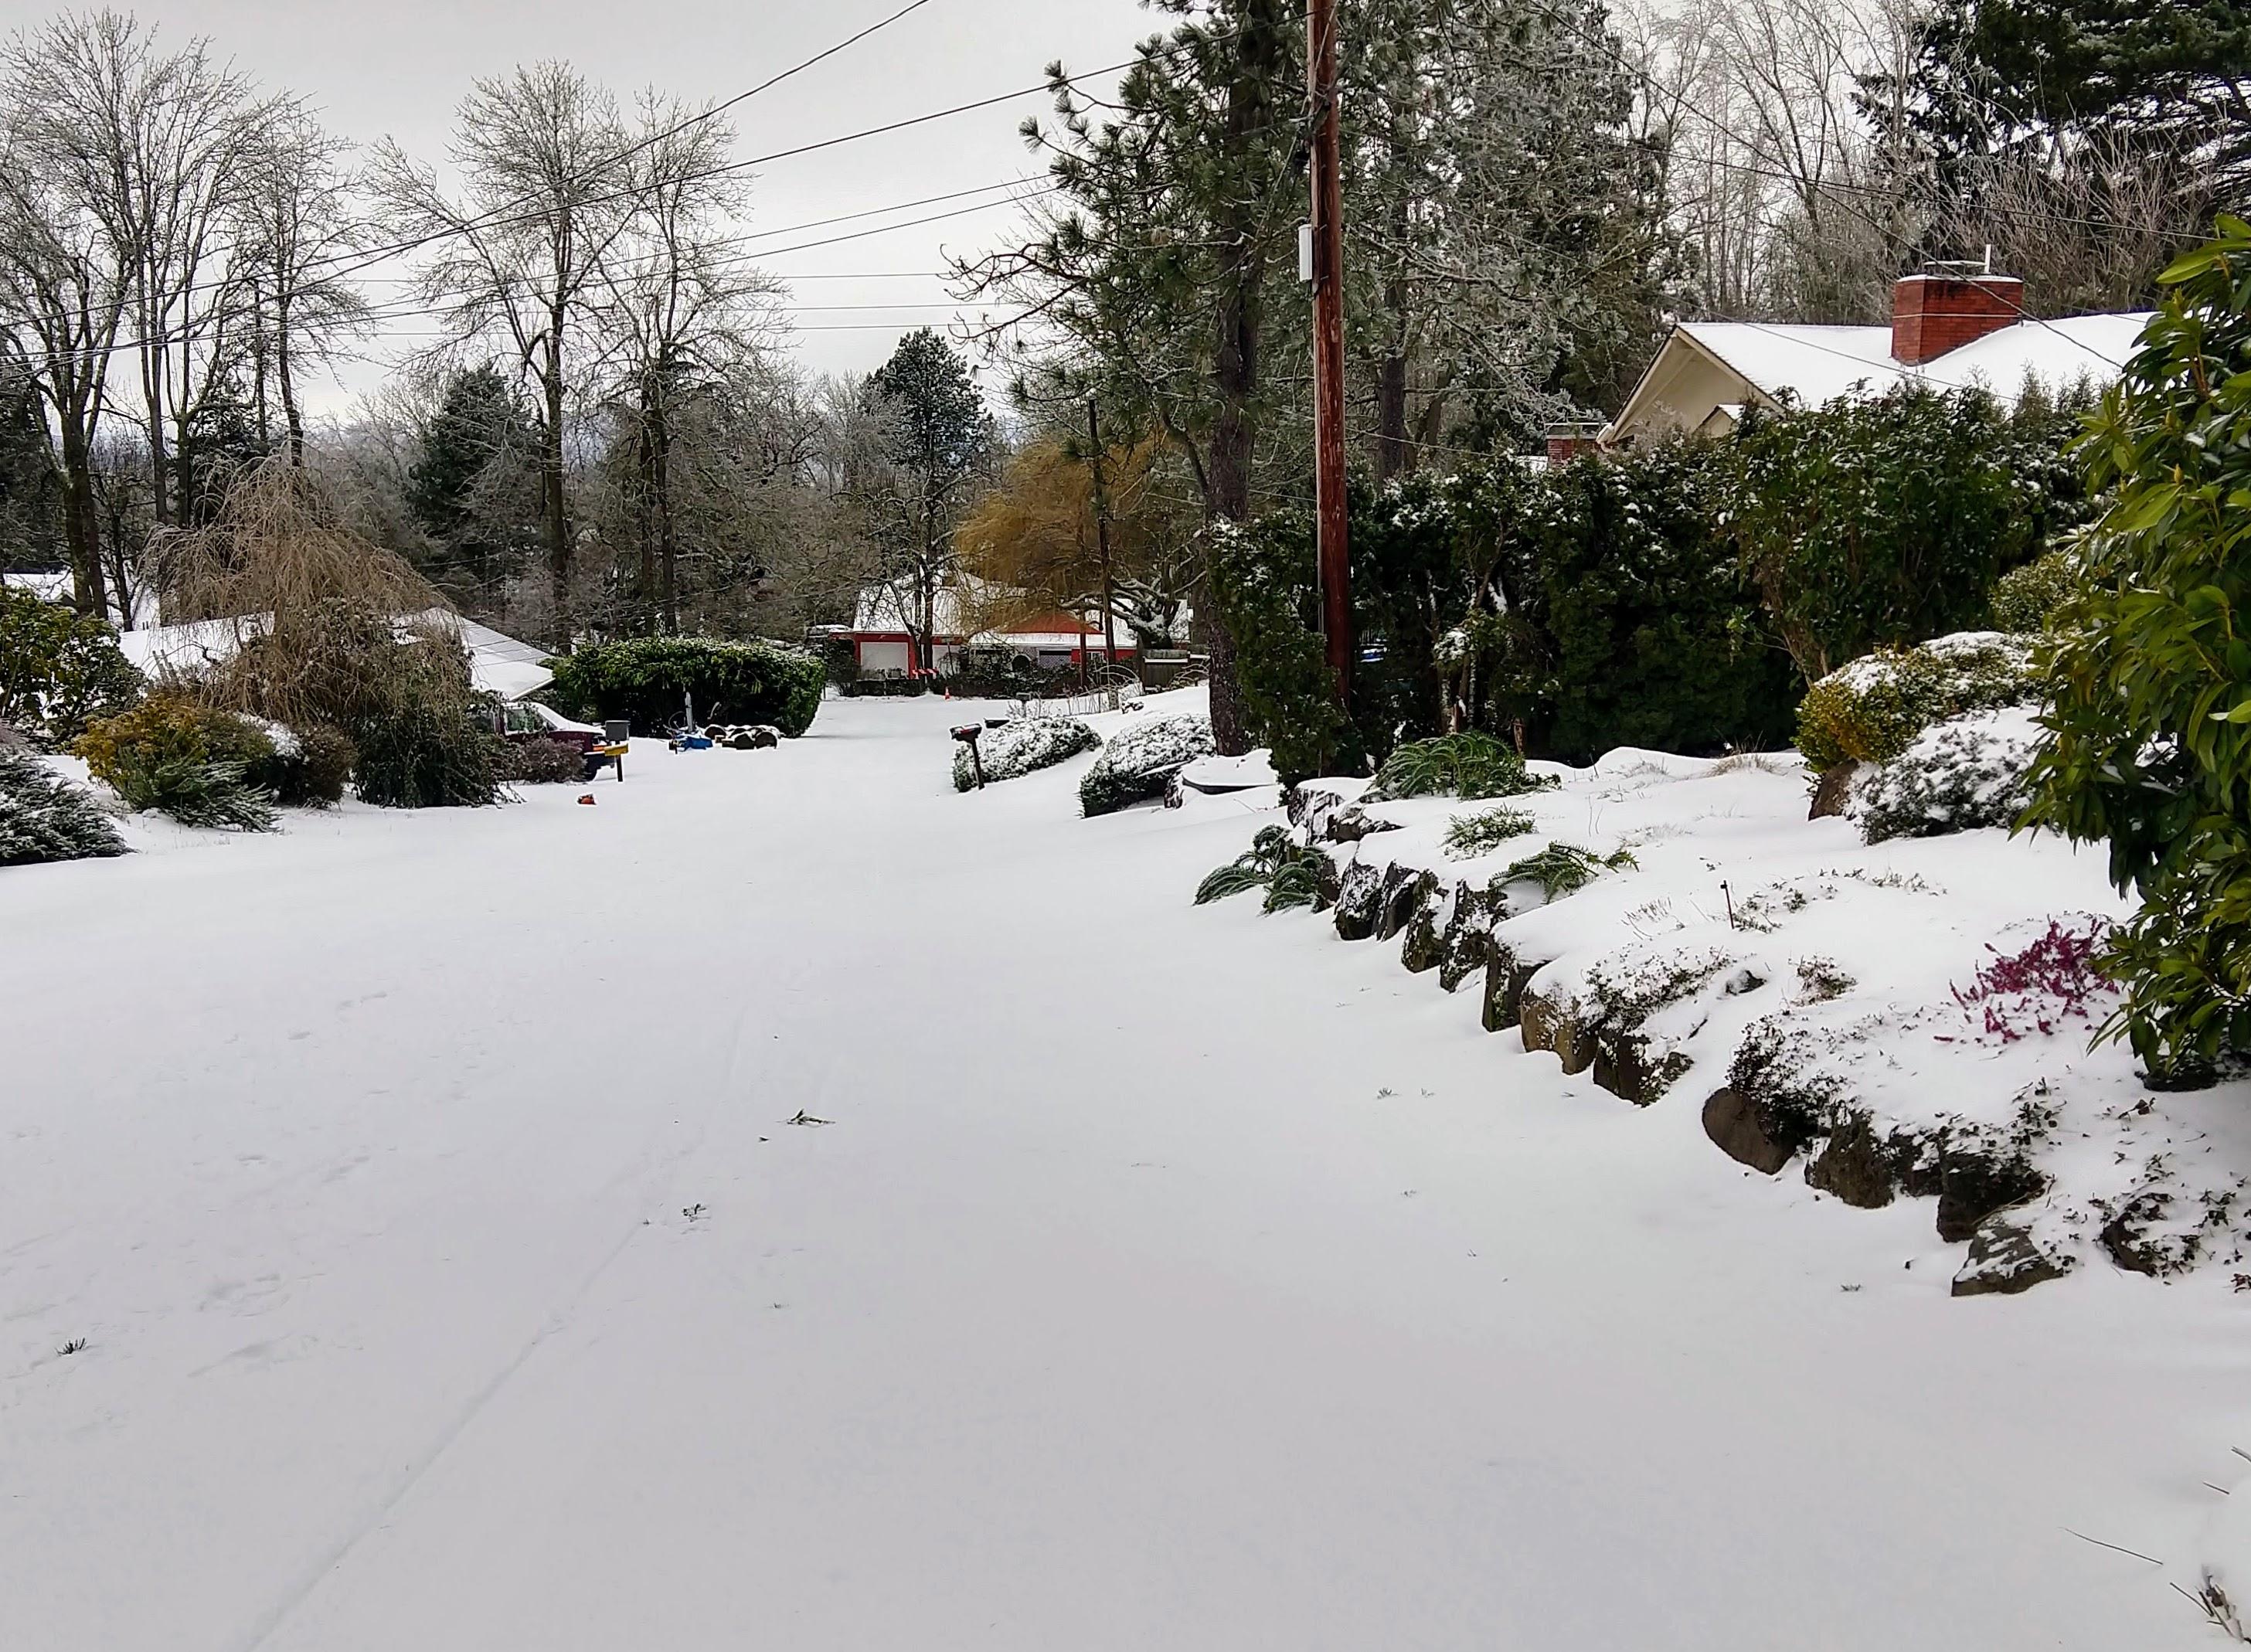 quiet snowy street